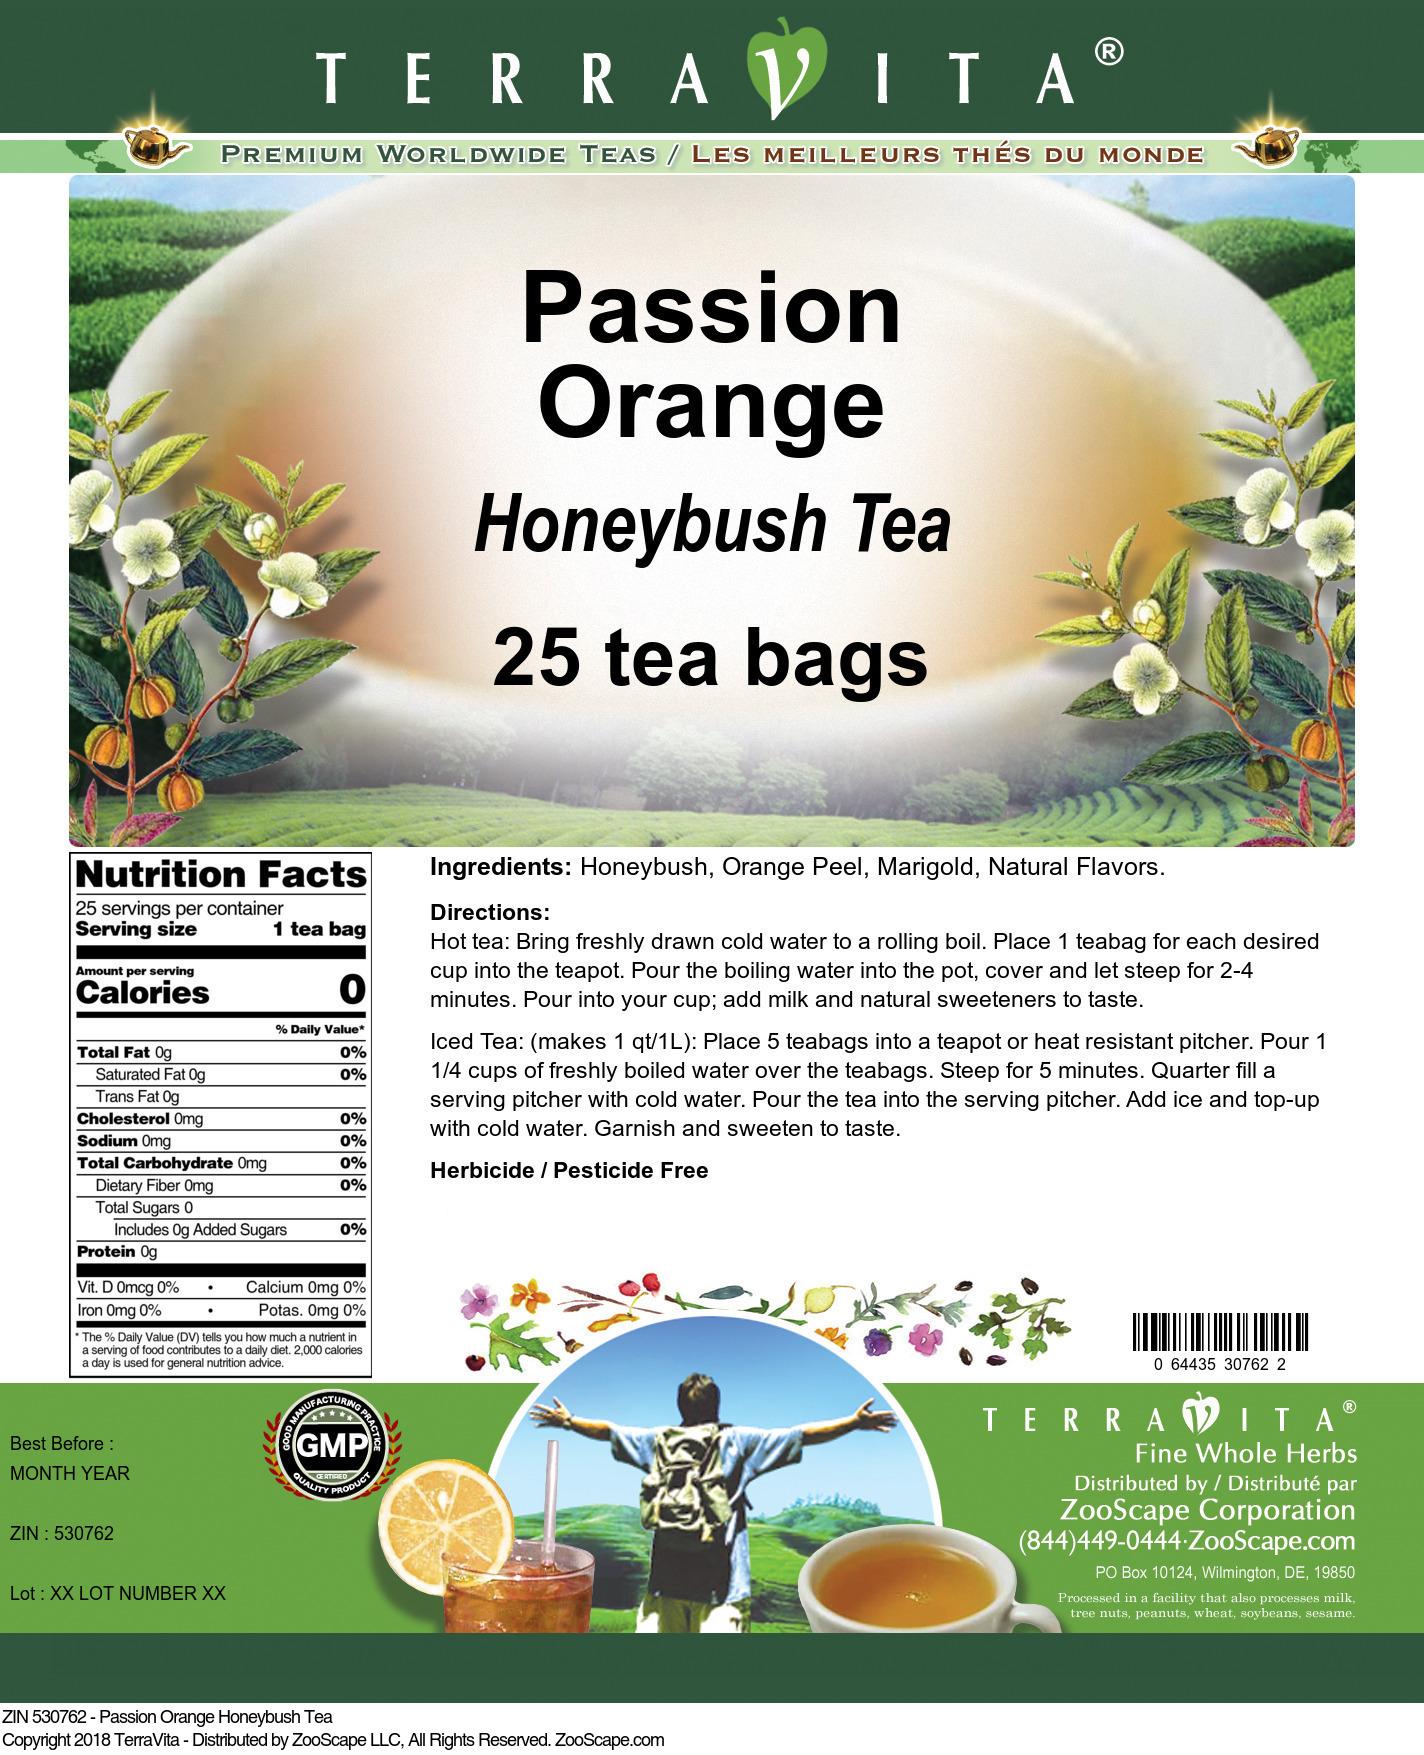 Passion Orange Honeybush Tea